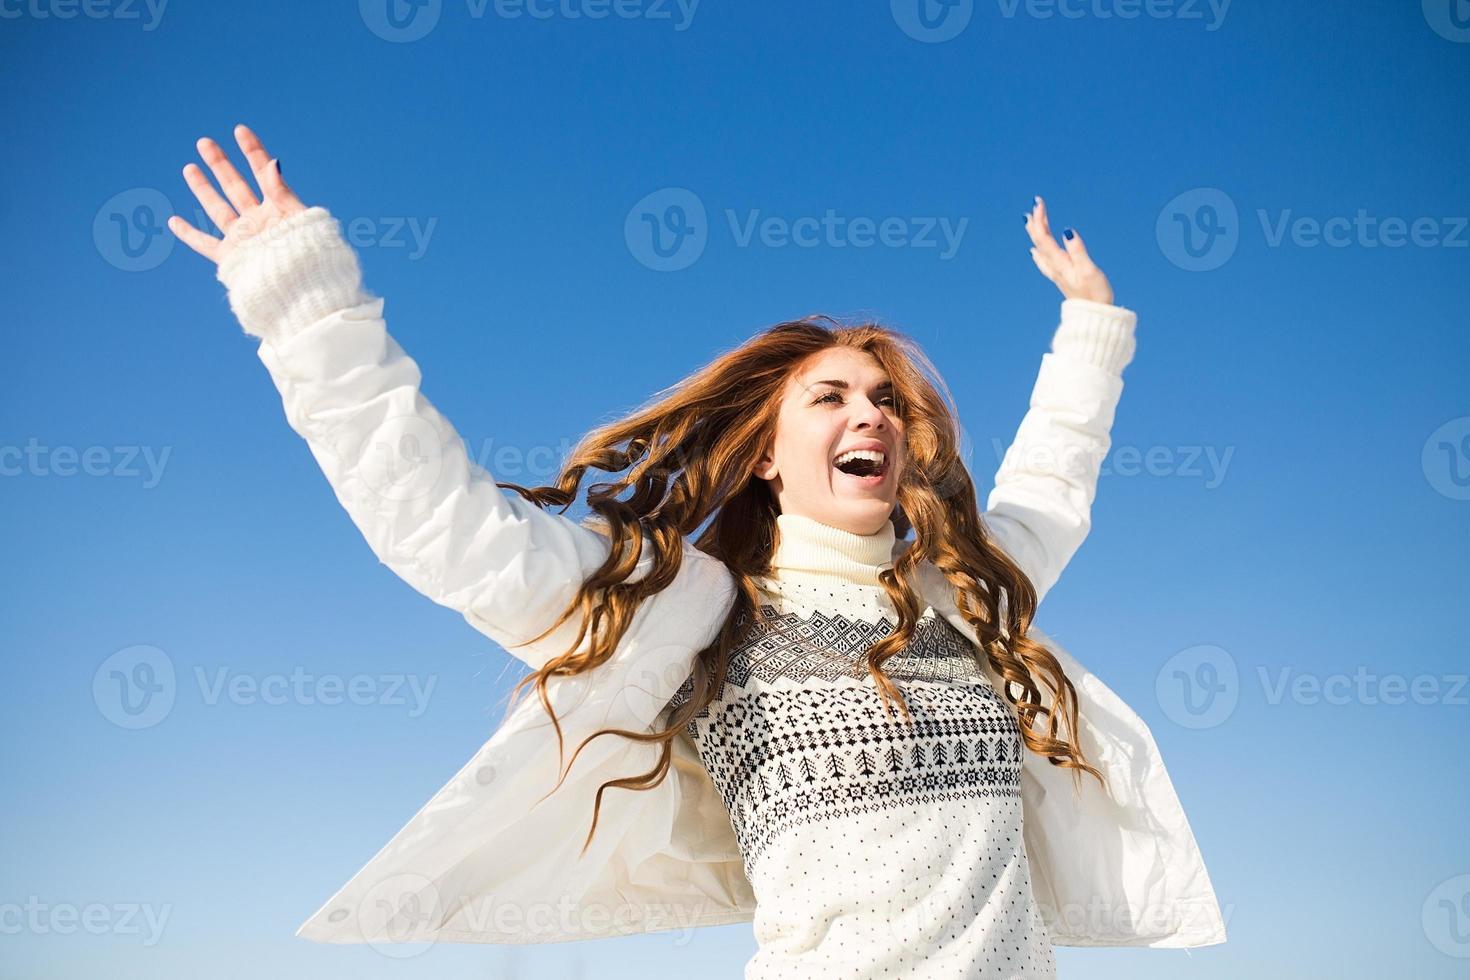 jovem feliz se divertir e desfrutar de neve fresca foto